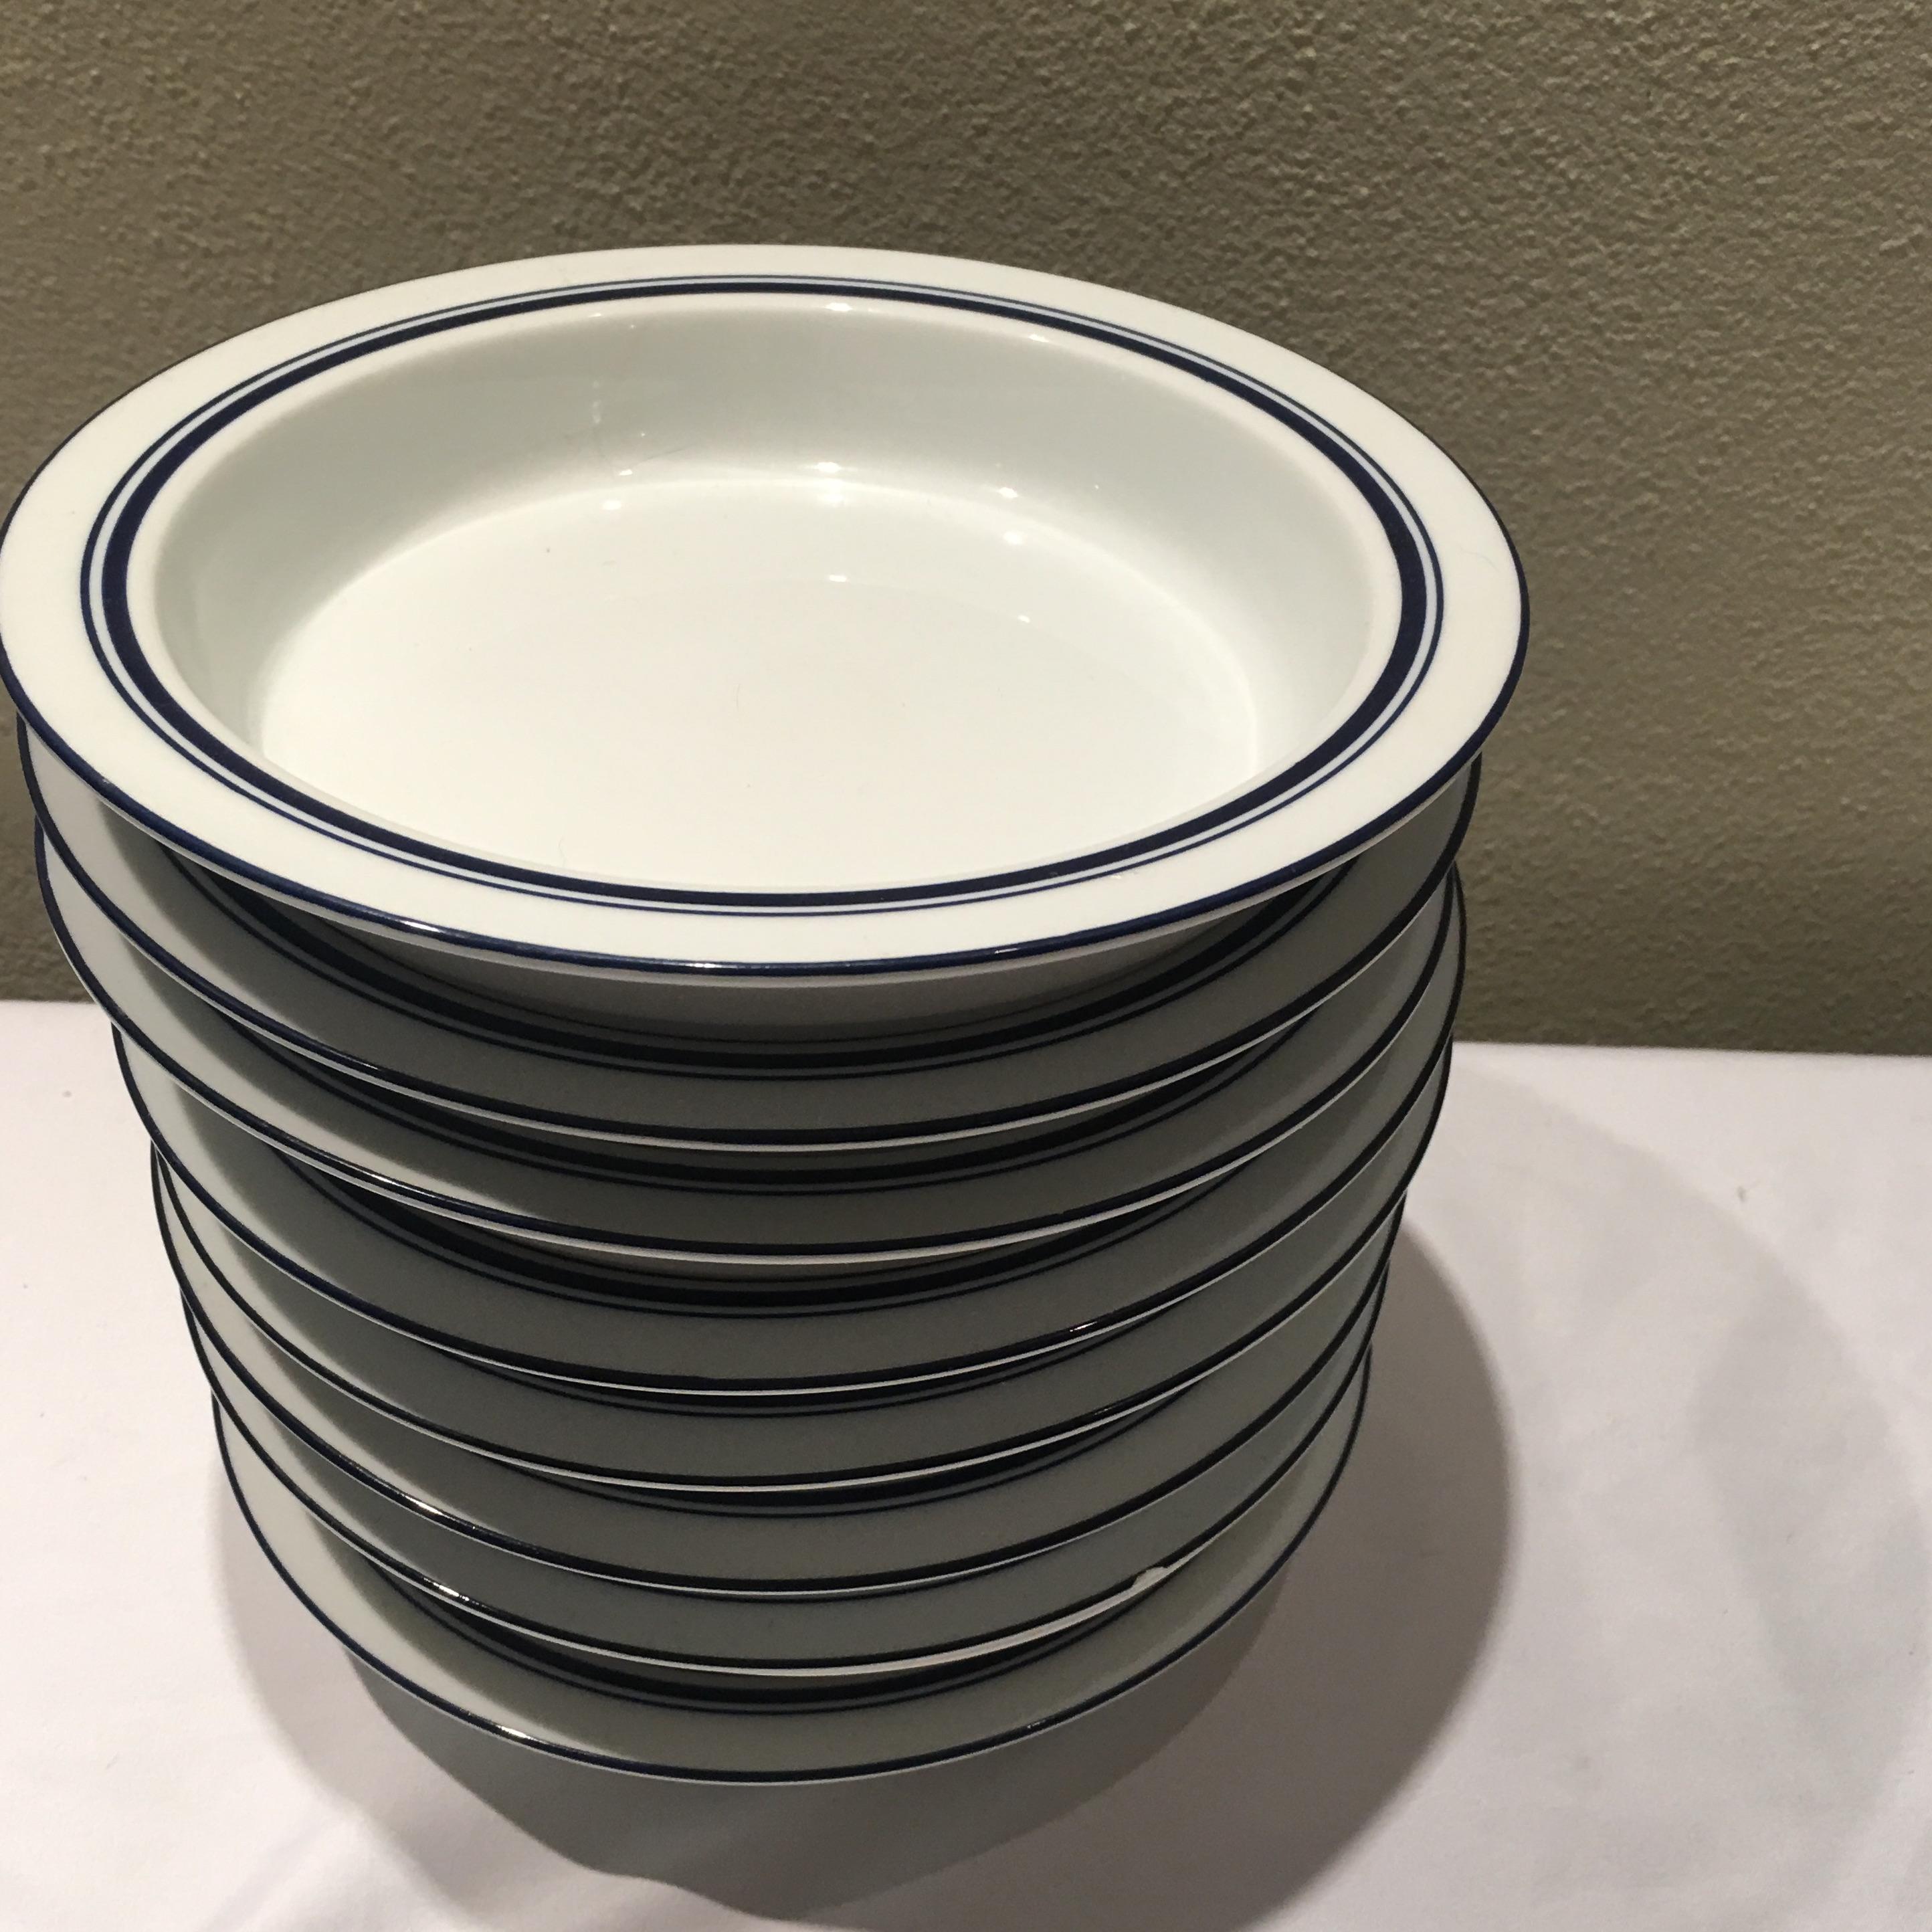 Vintage Dansk Bistro Dinnerware - Image 7 of 9 & Vintage Dansk Bistro Dinnerware | Chairish